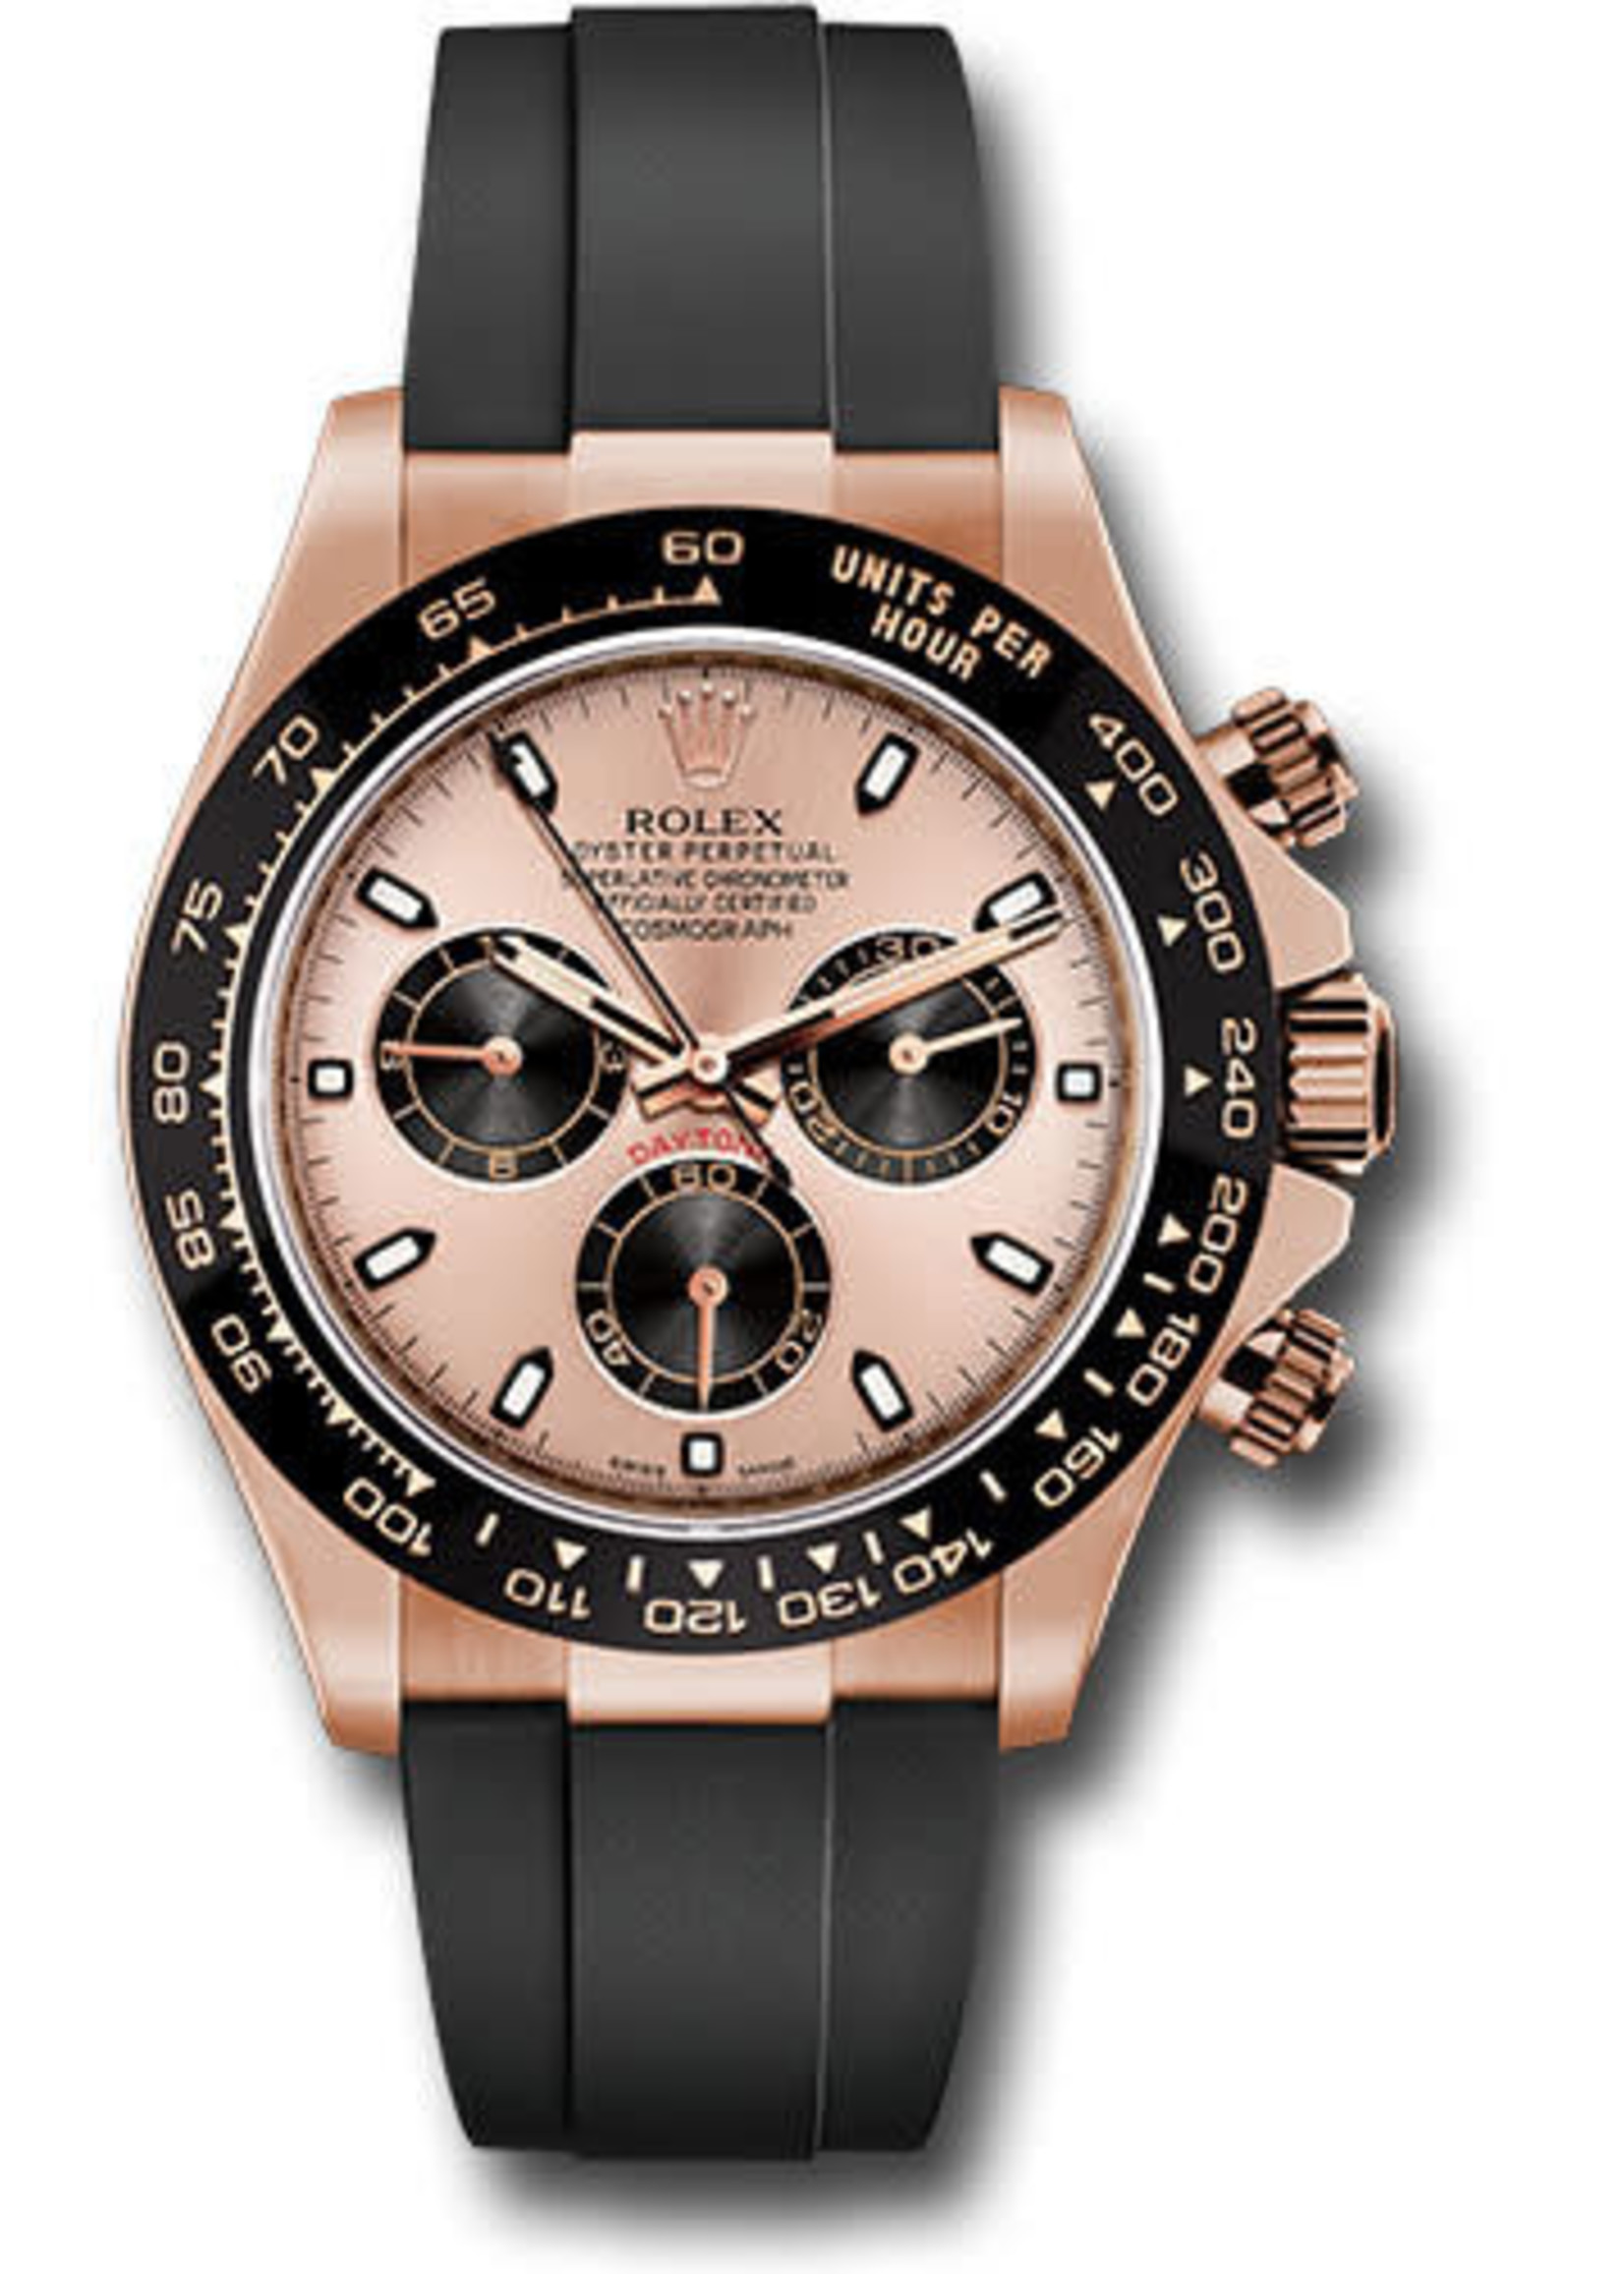 Rolex ROLEX DAYTONA EVEROSE 40MM 2021 (B+P) #116515LN